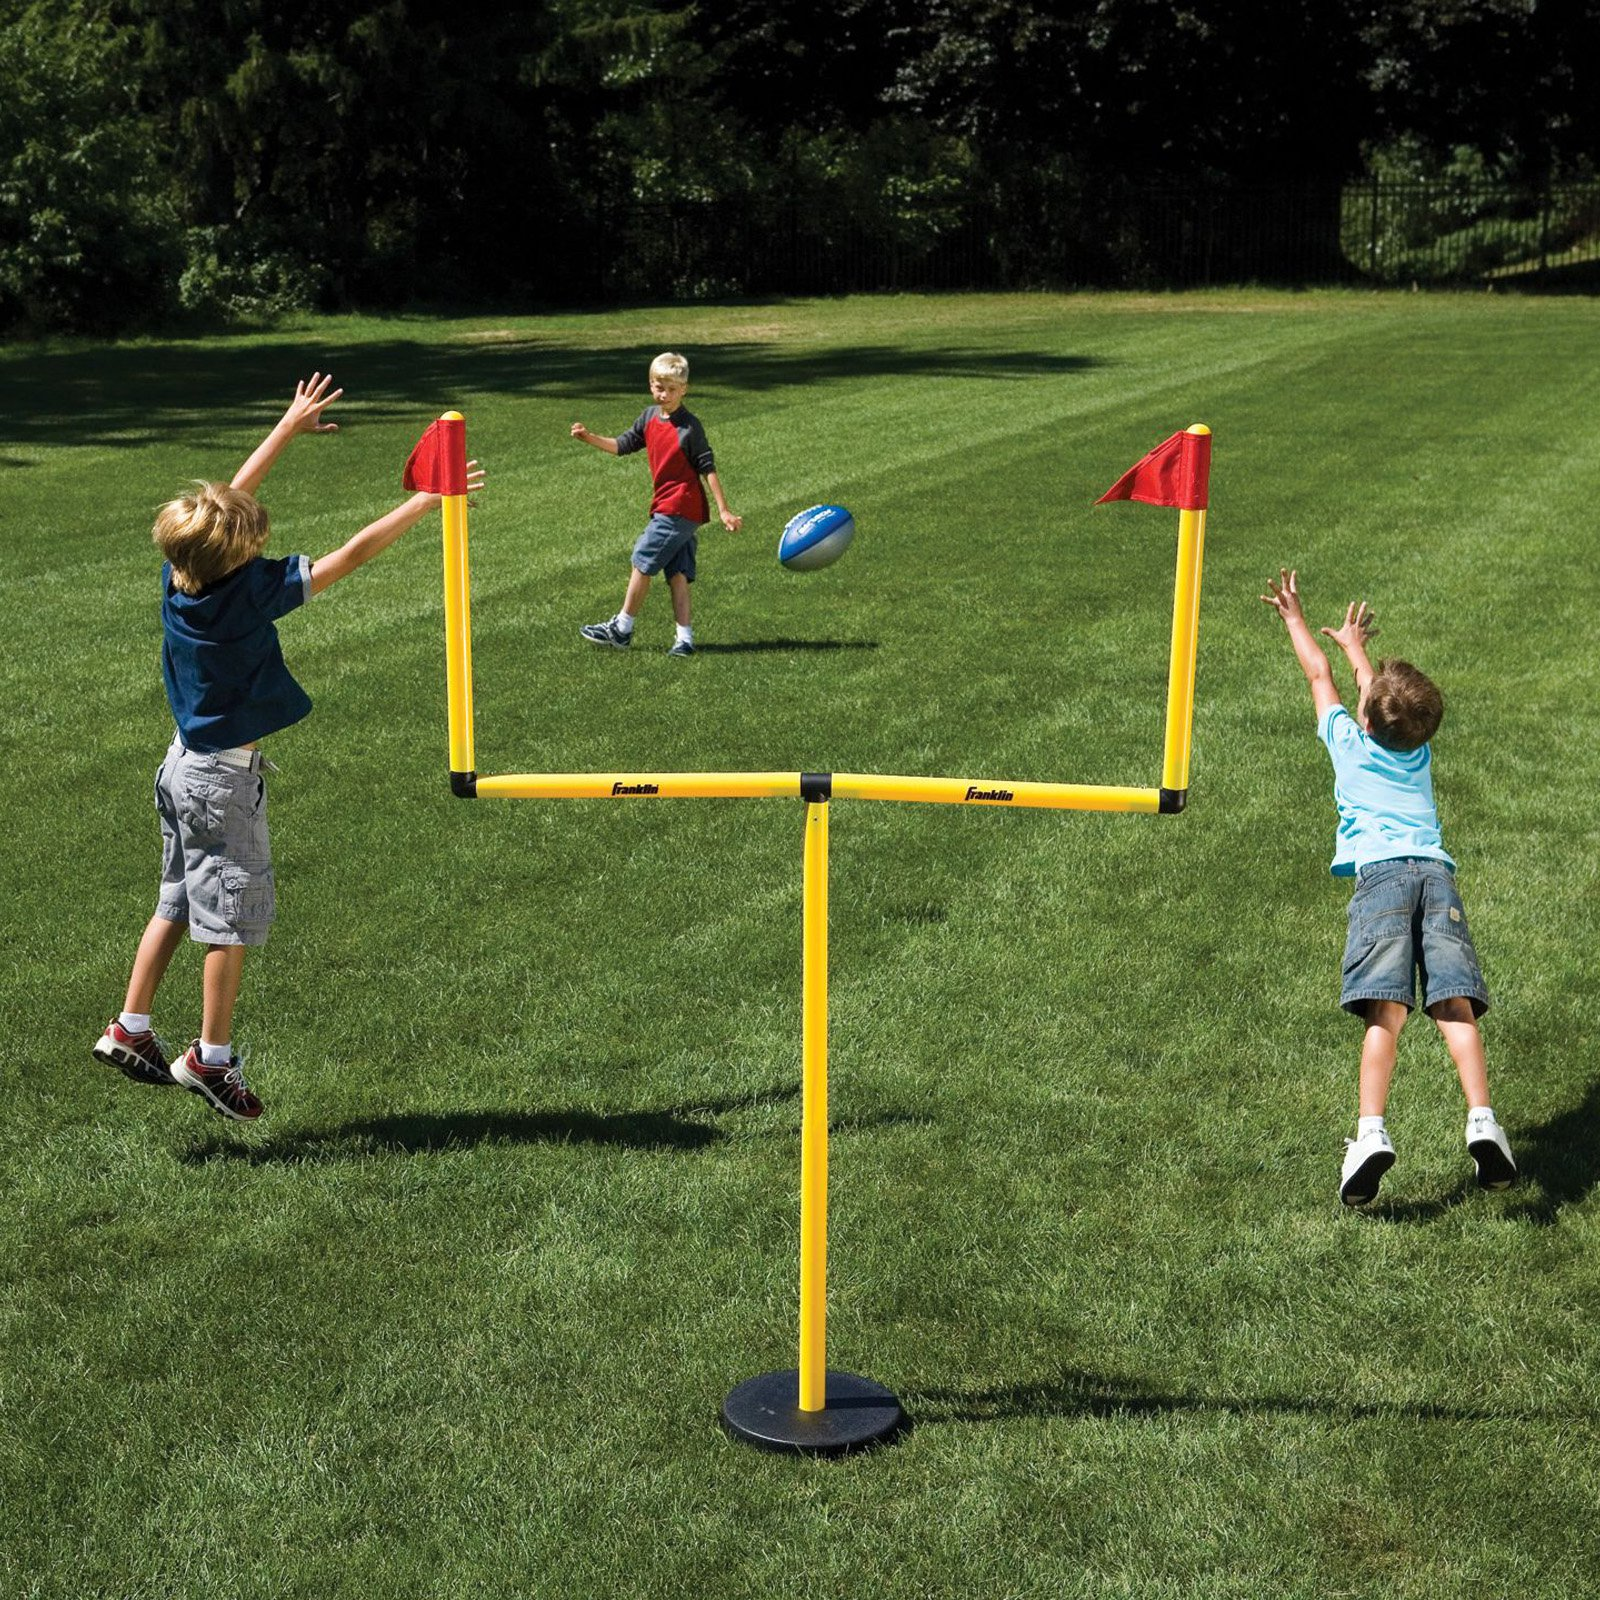 Franklin Go Pro Youth Football Goal Post Set